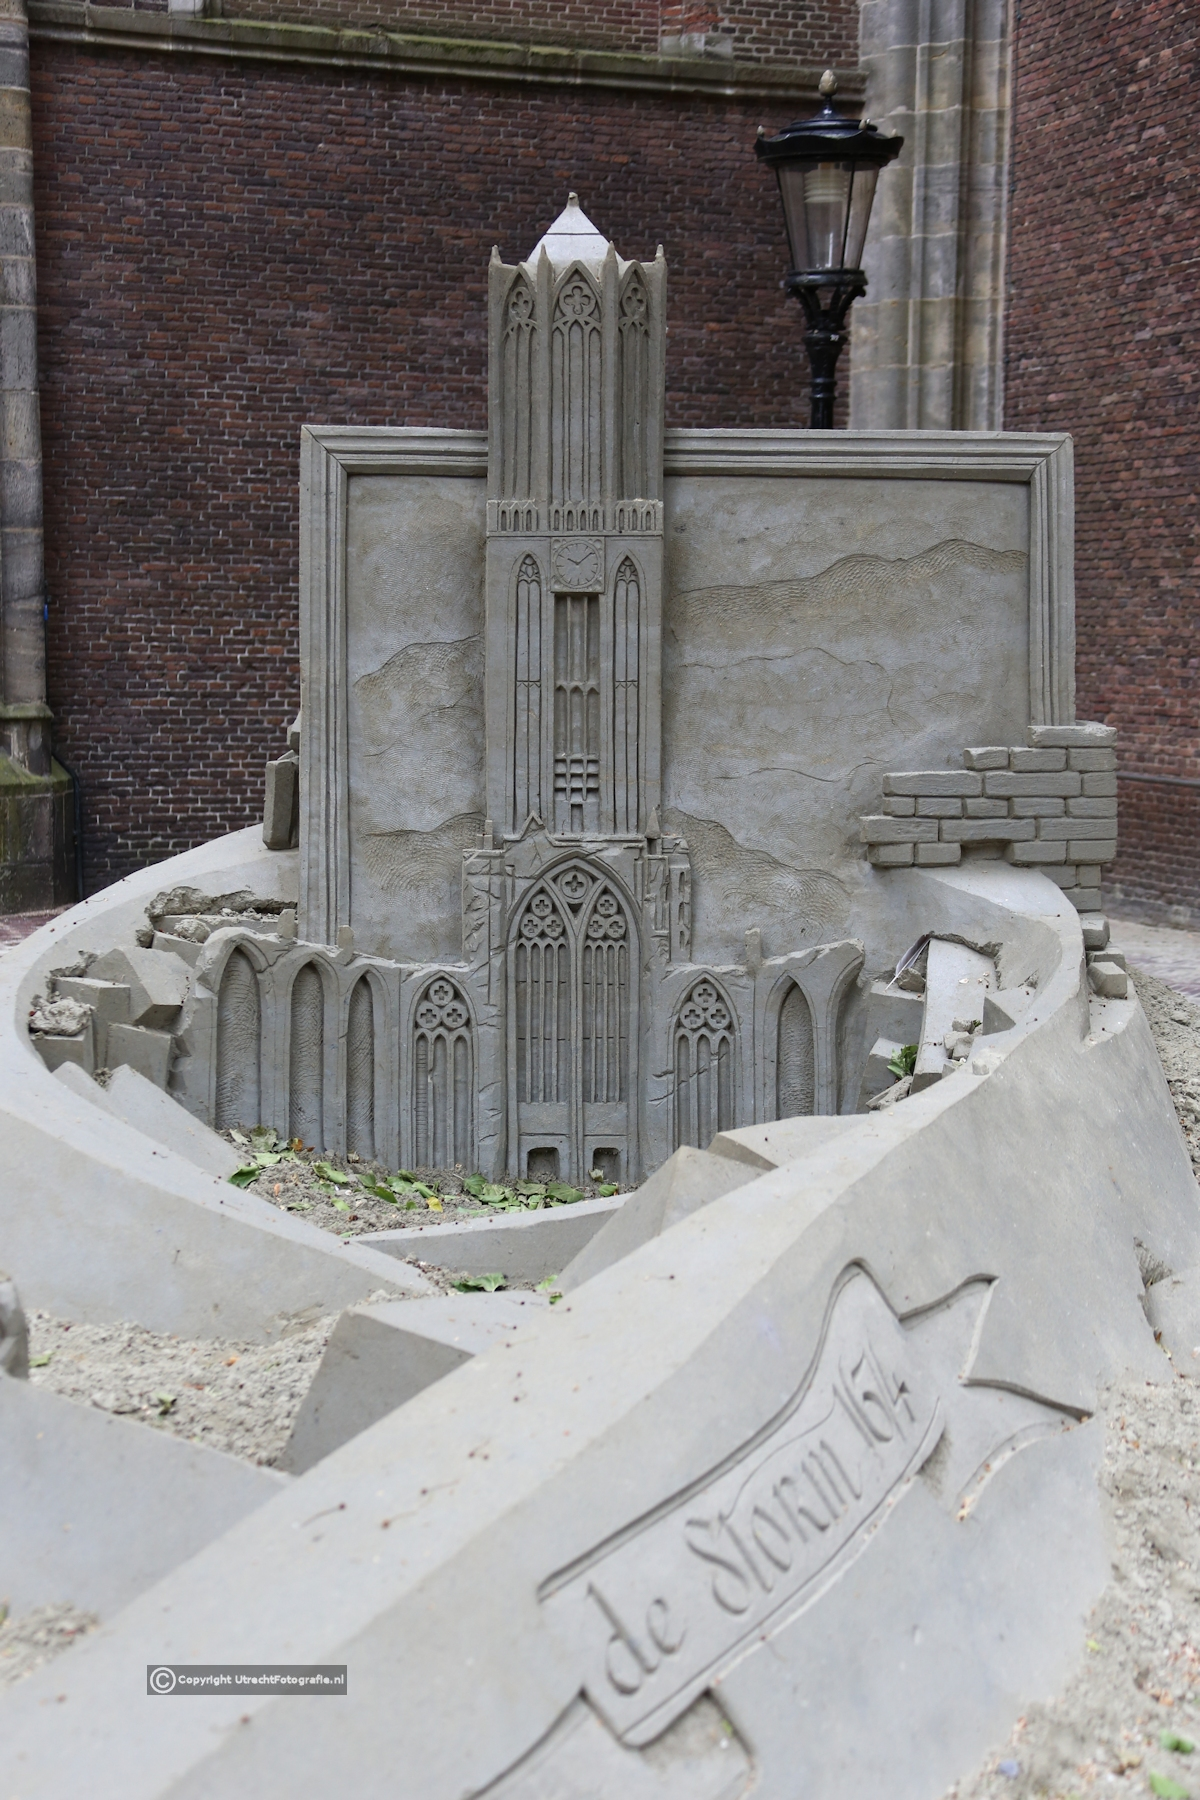 20170520 Zandsculptuur Domplein 1